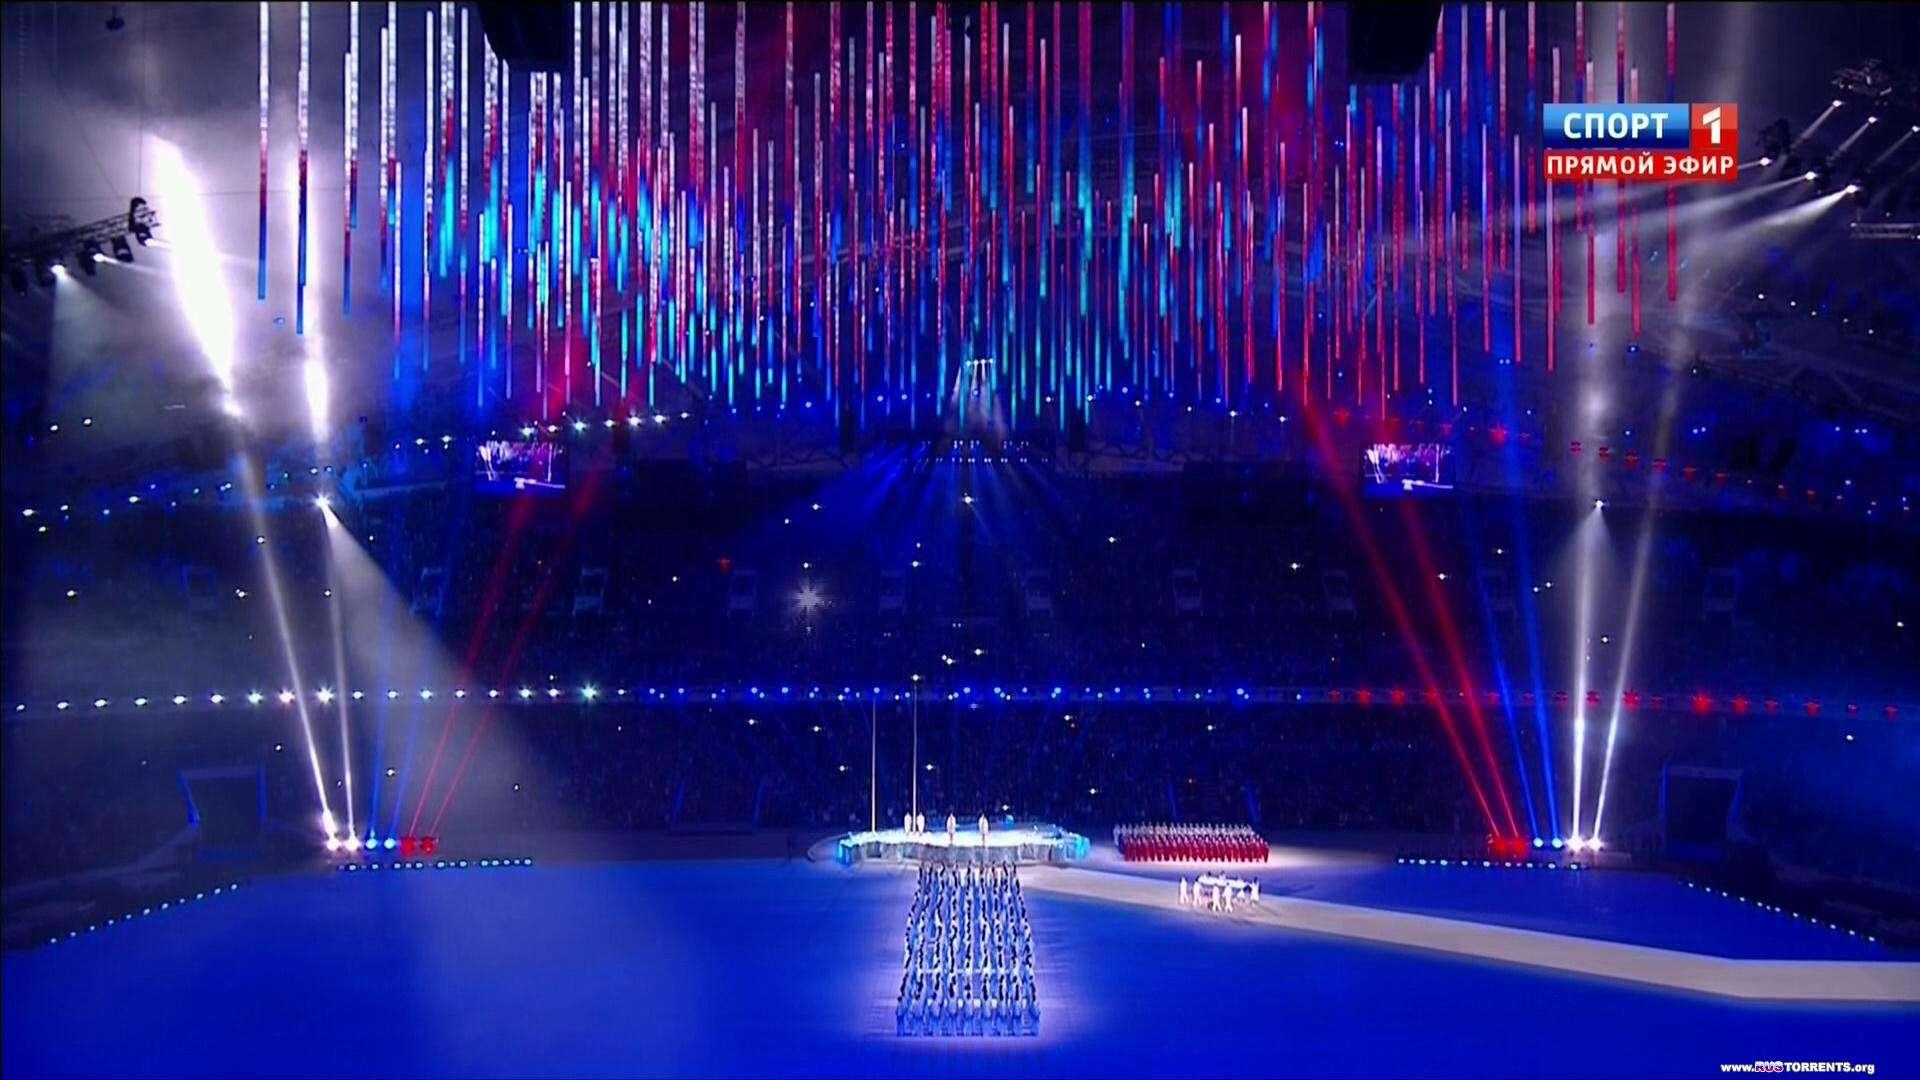 XI Зимние Паралимпийские игры. Сочи. Церемония открытия [Спорт 1 HD] | HDTV 1080i